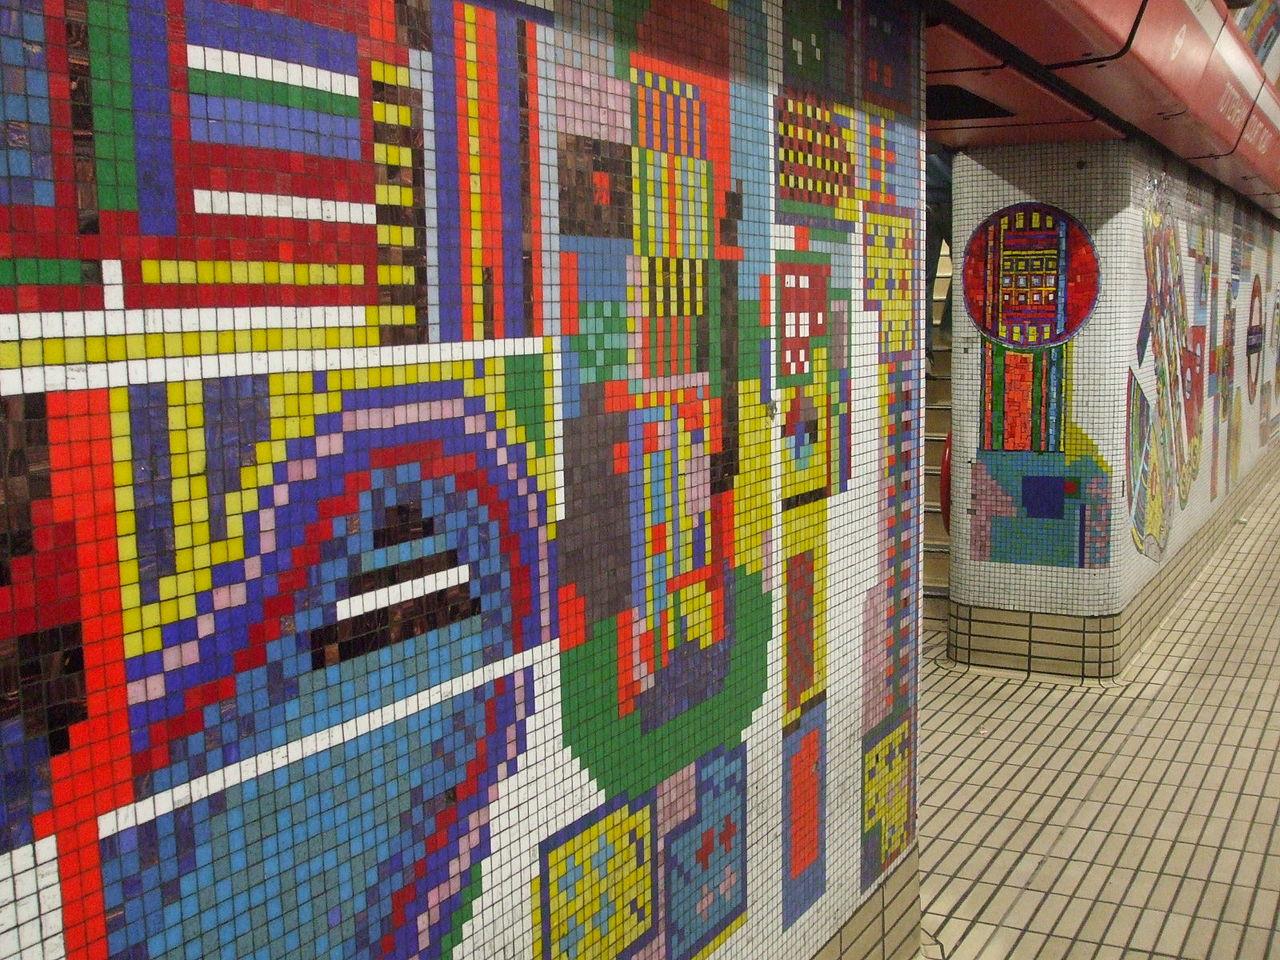 File:Tottenham Court Road stn Central line mosaic.JPG ...